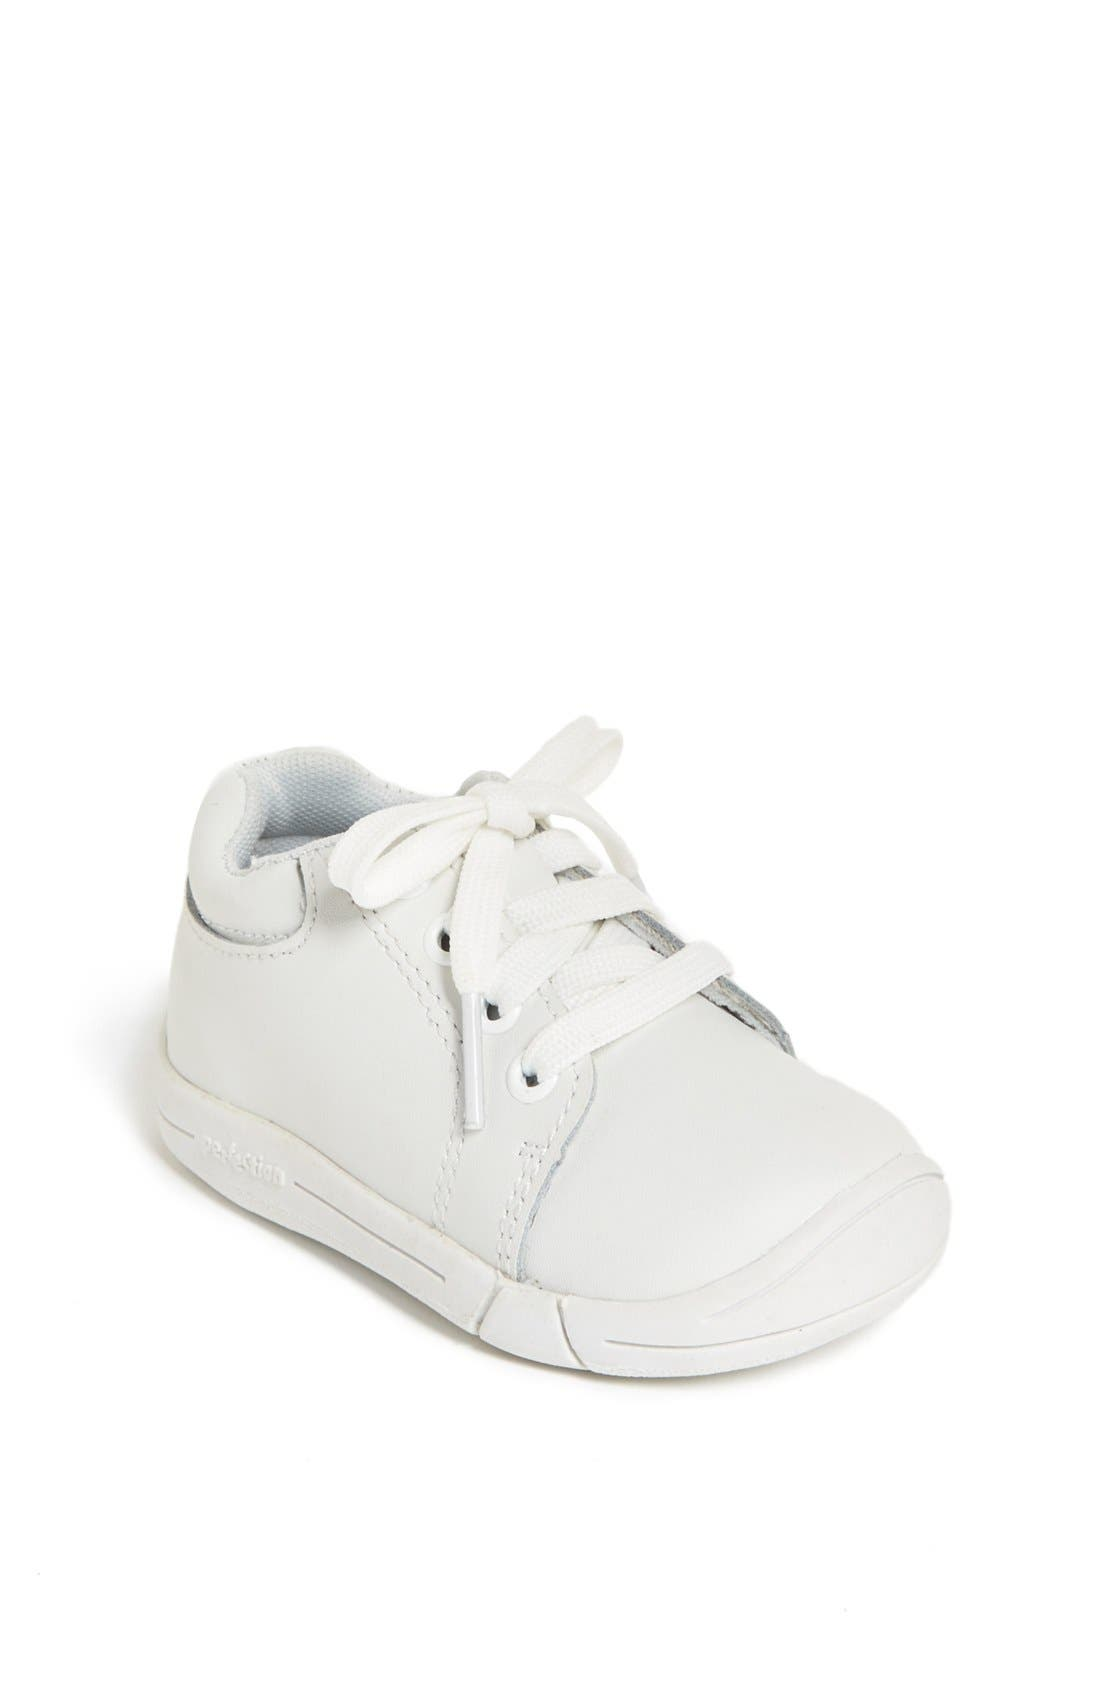 'Perfection' Sneaker,                             Main thumbnail 1, color,                             100